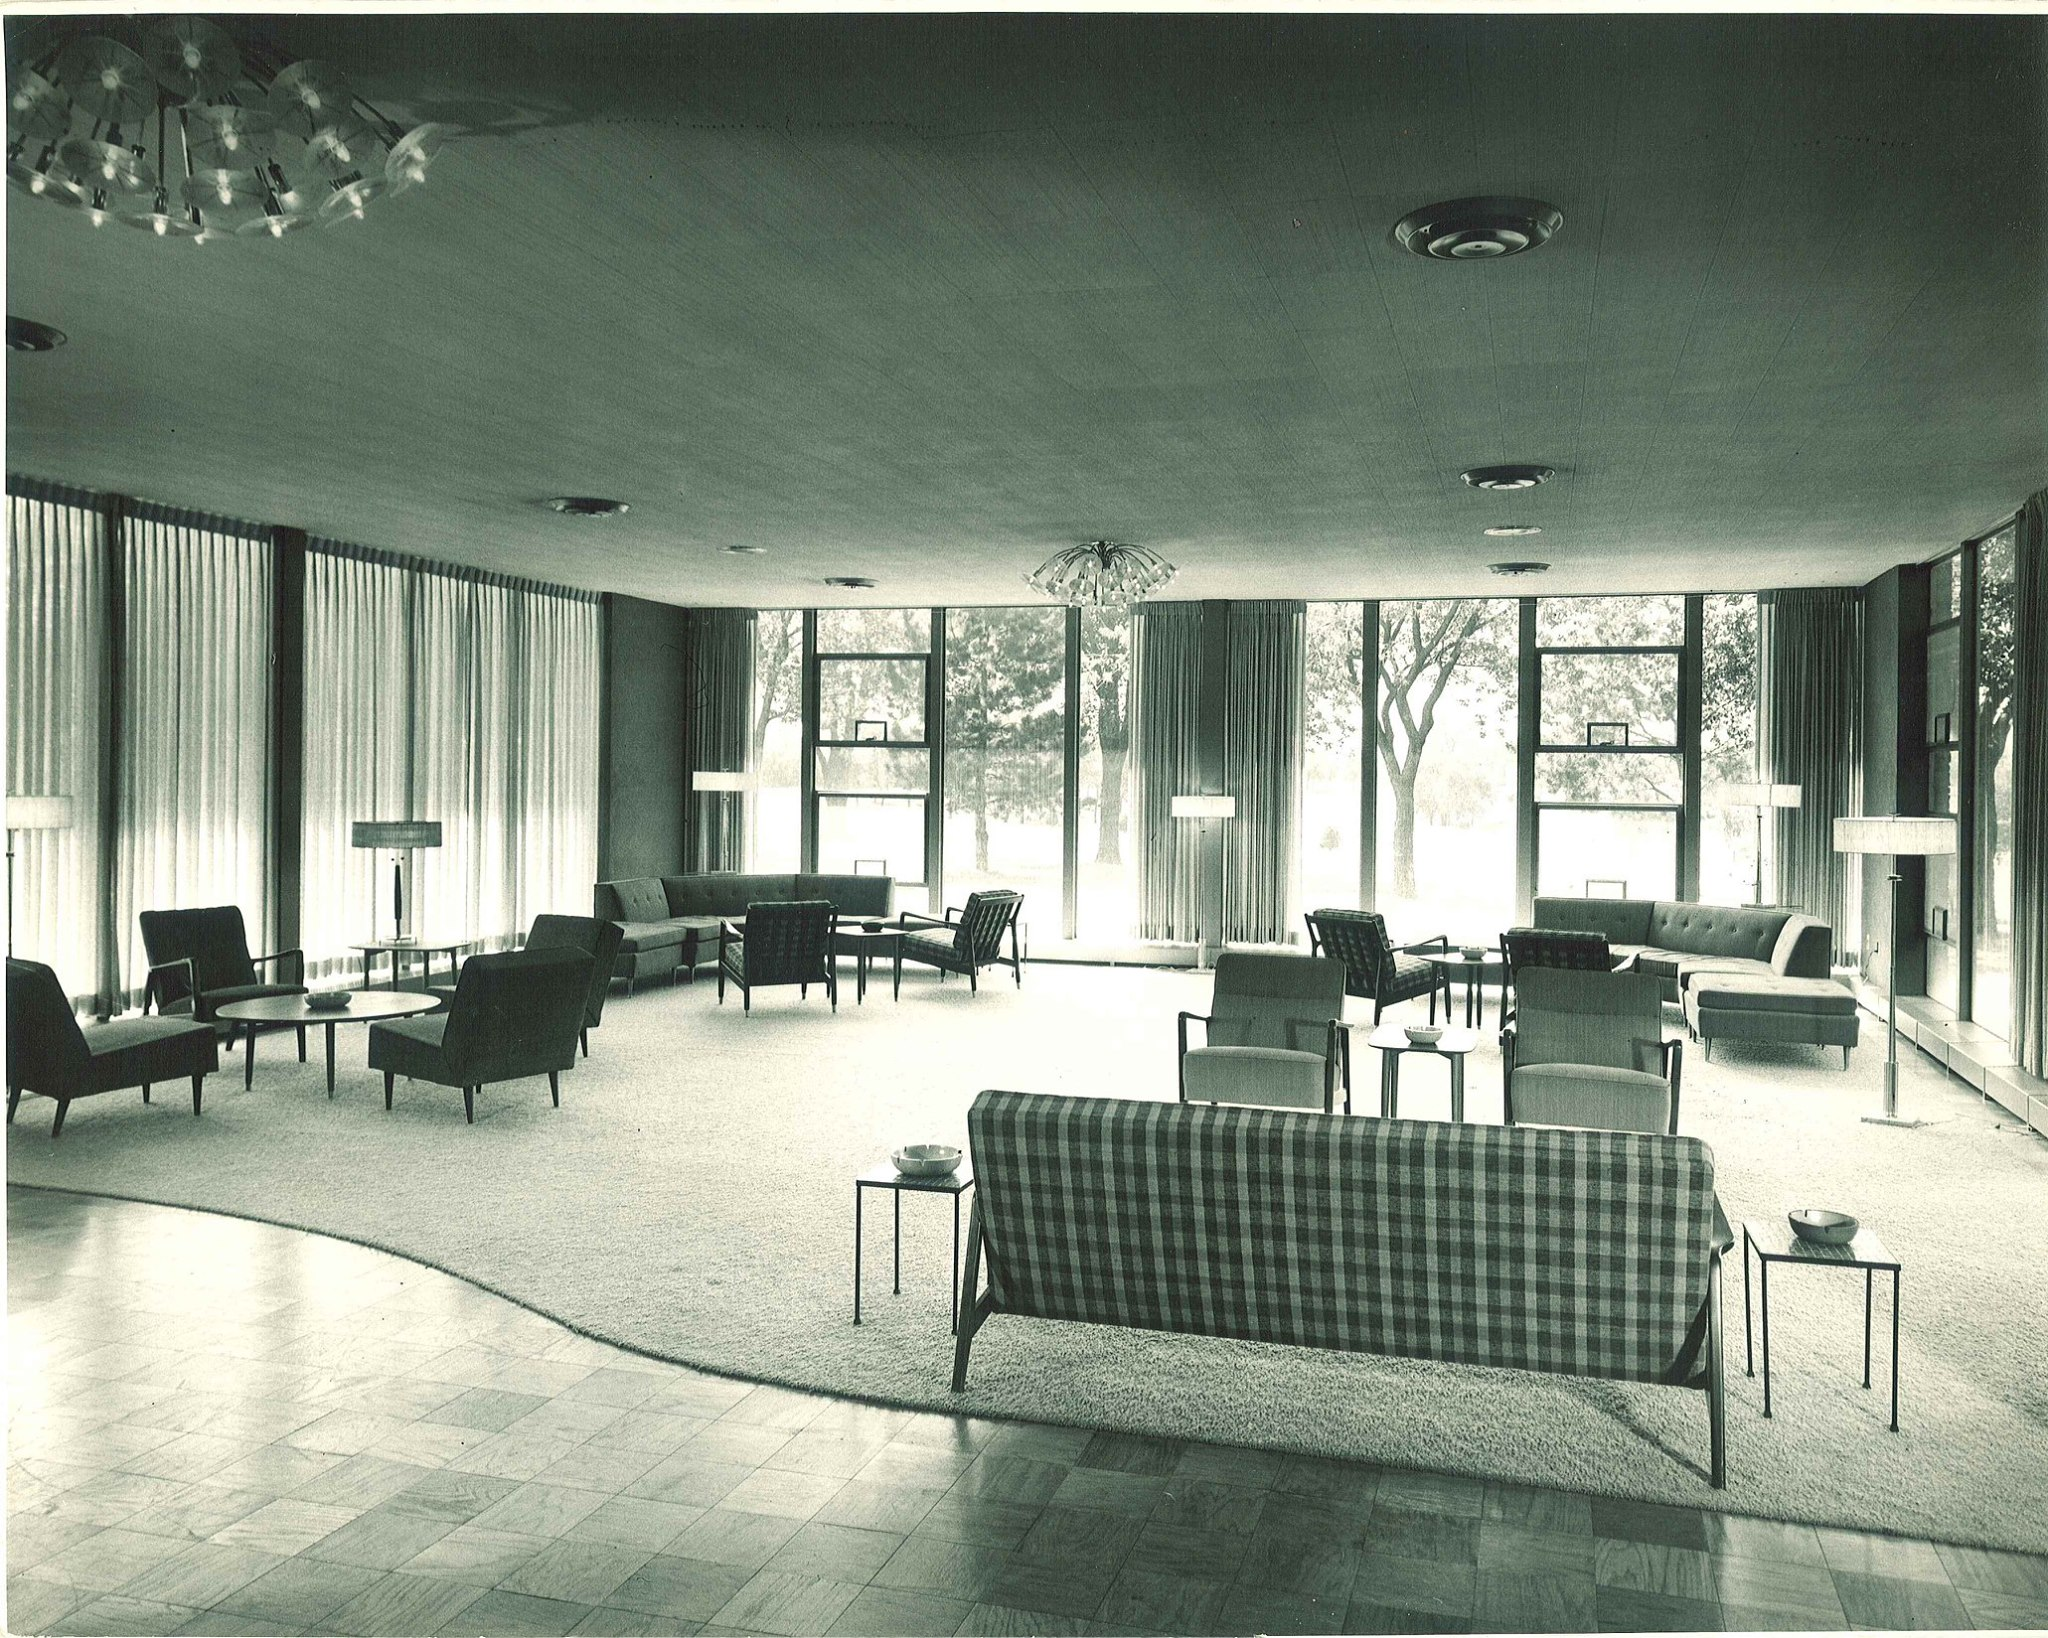 1955CountryClub3.jpg